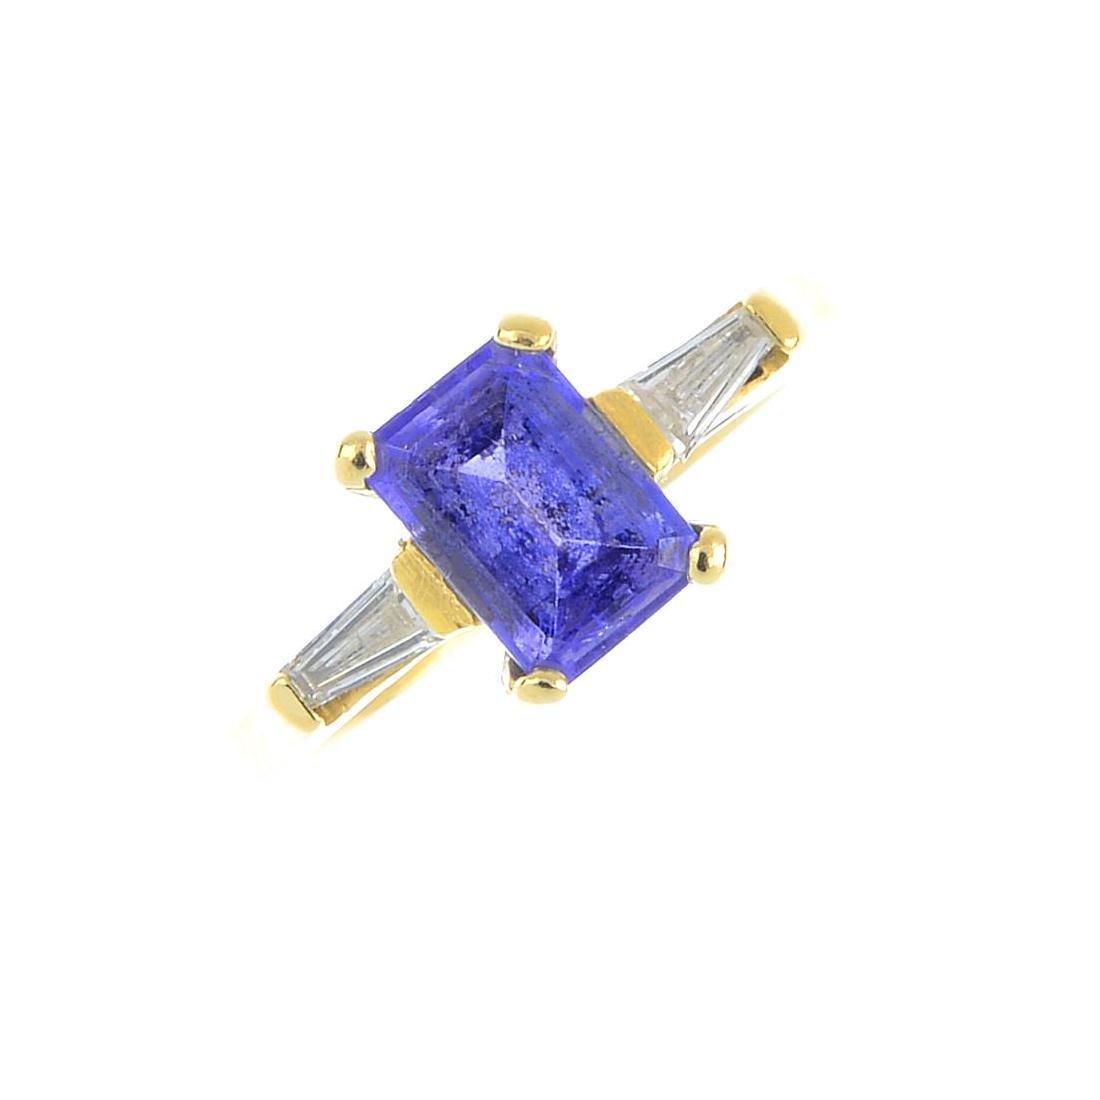 A tanzanite and diamond ring. The rectangular-shape